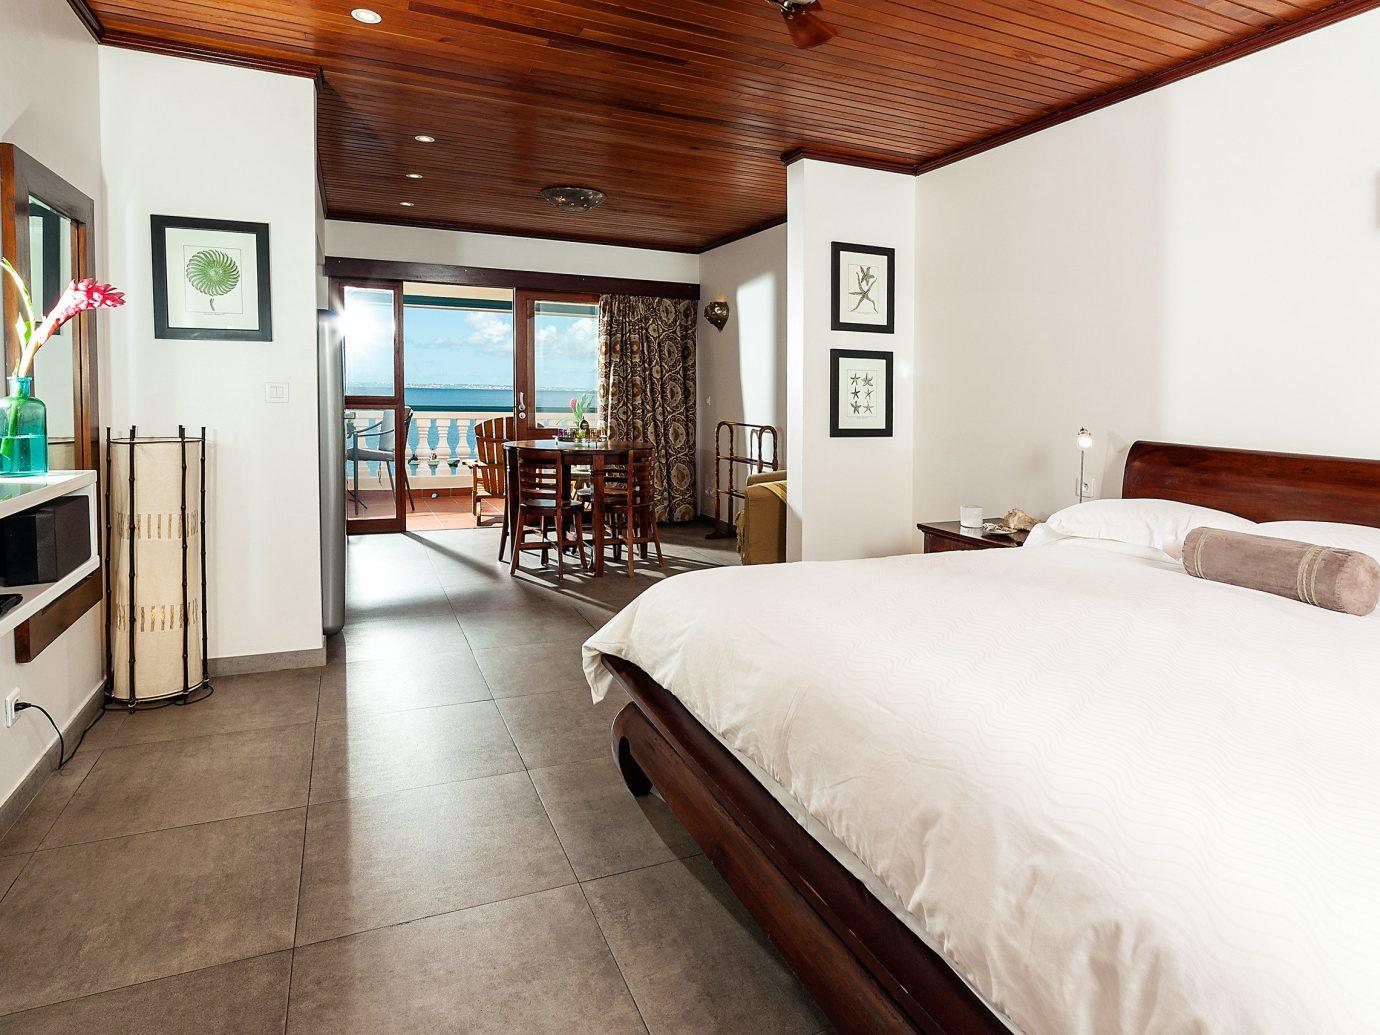 Hotels indoor bed floor wall ceiling room Bedroom property real estate hotel interior design estate Suite